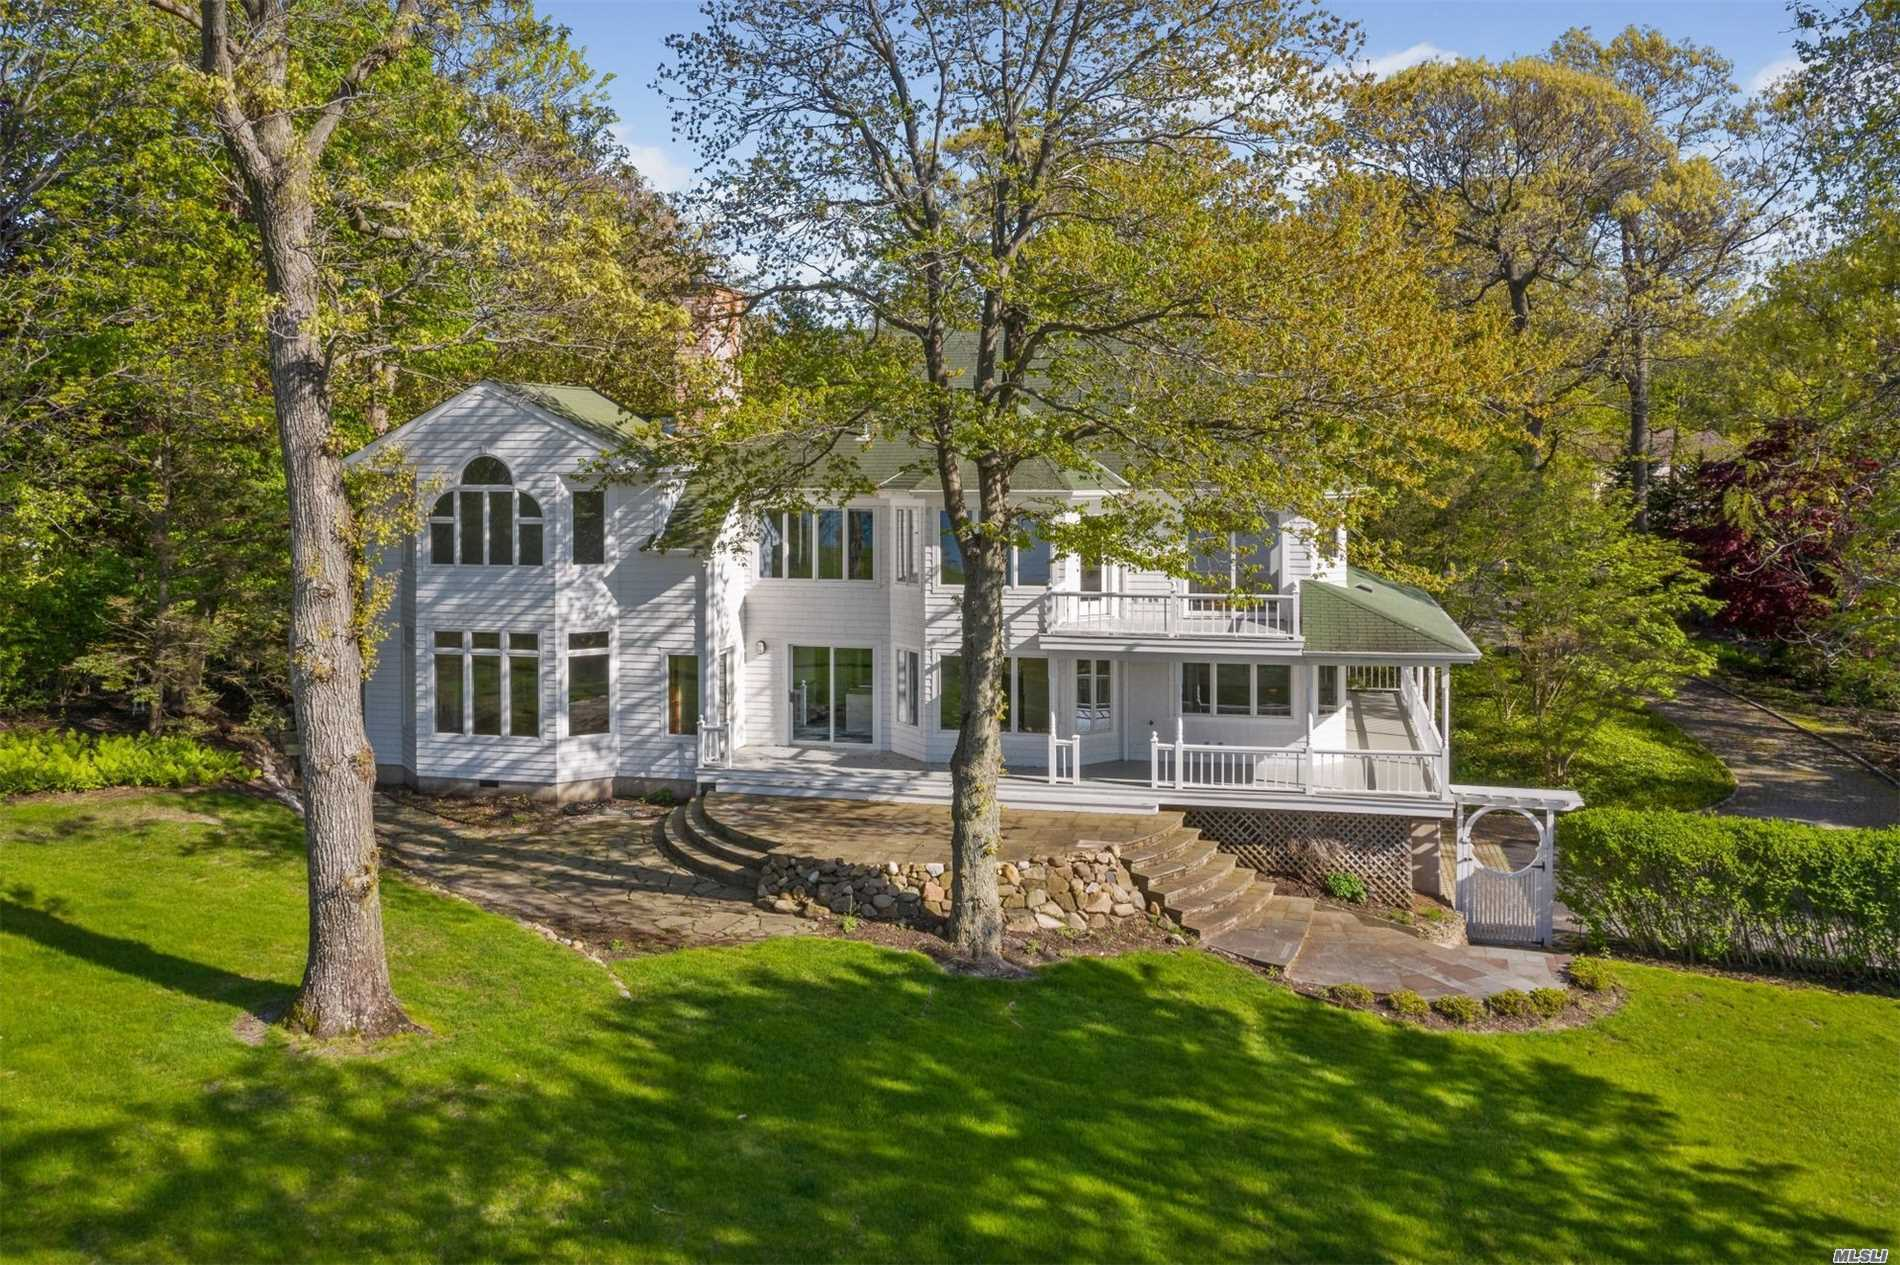 Property for sale at 35 Soundview Drive, Shoreham NY 11786, Shoreham,  New York 11786